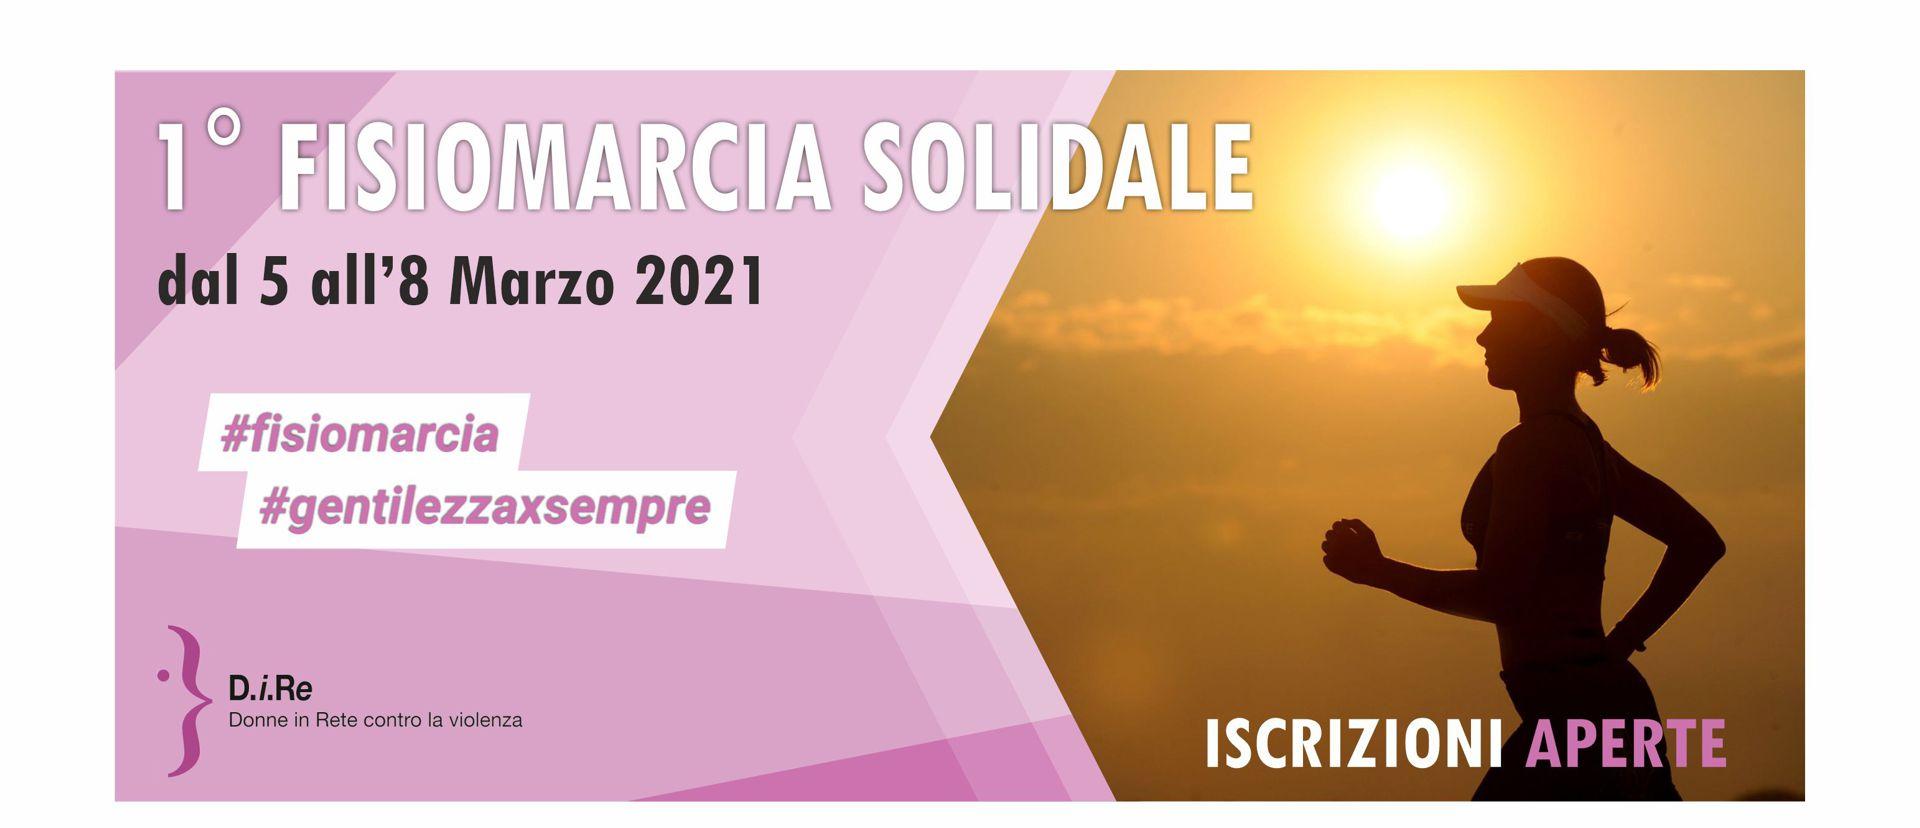 copertina fisiomarcia 2021 desktop